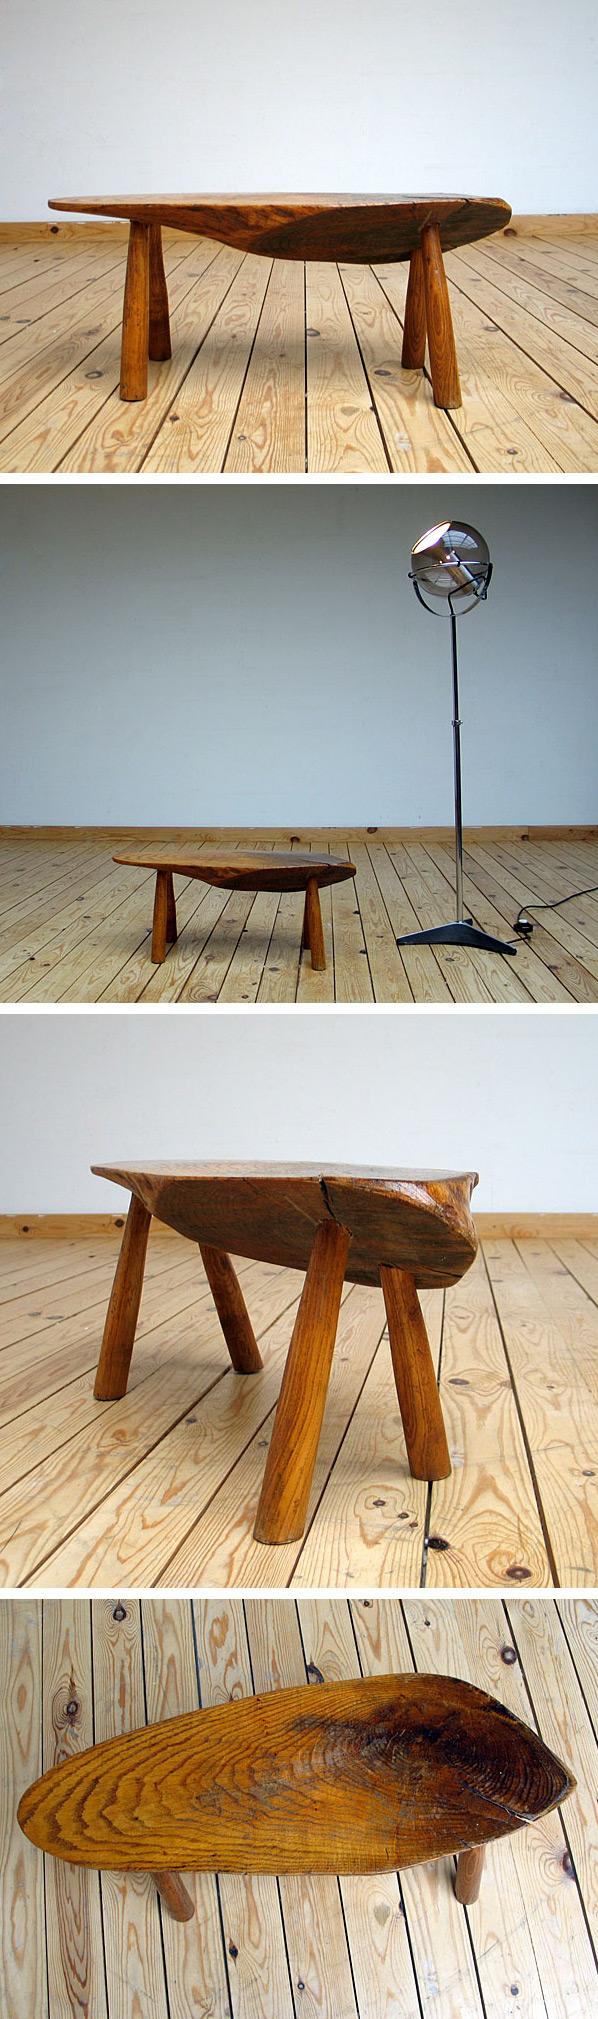 Unique freeform wooden custom stool Large